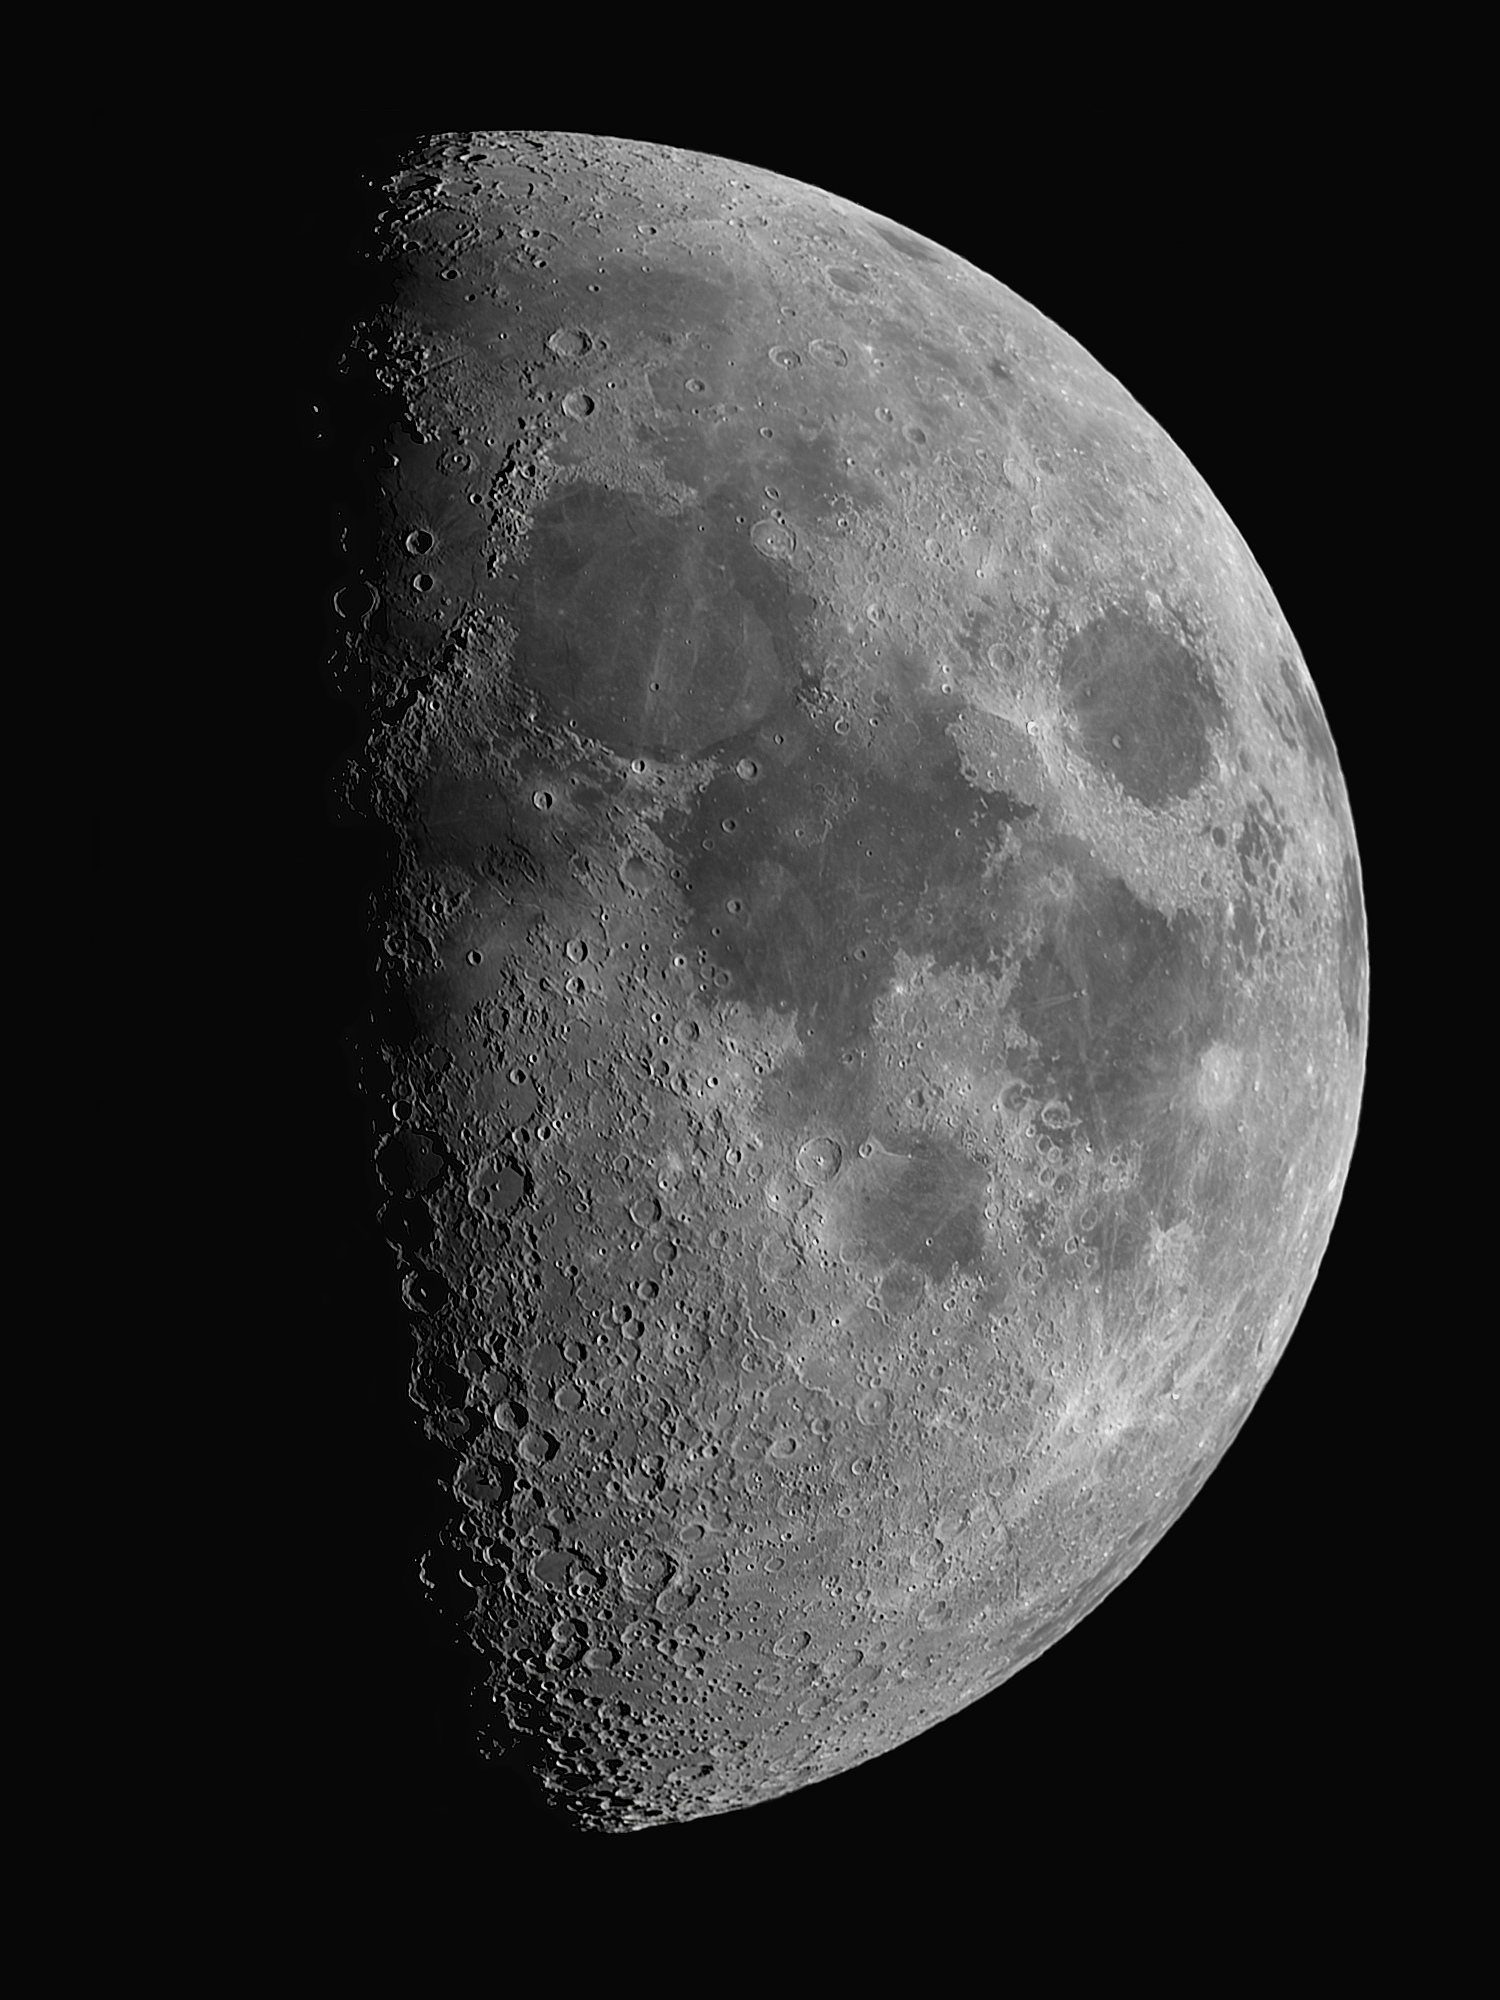 Lune.thumb.jpg.b47215d7435ecab358ed8501288ac9ff.jpg